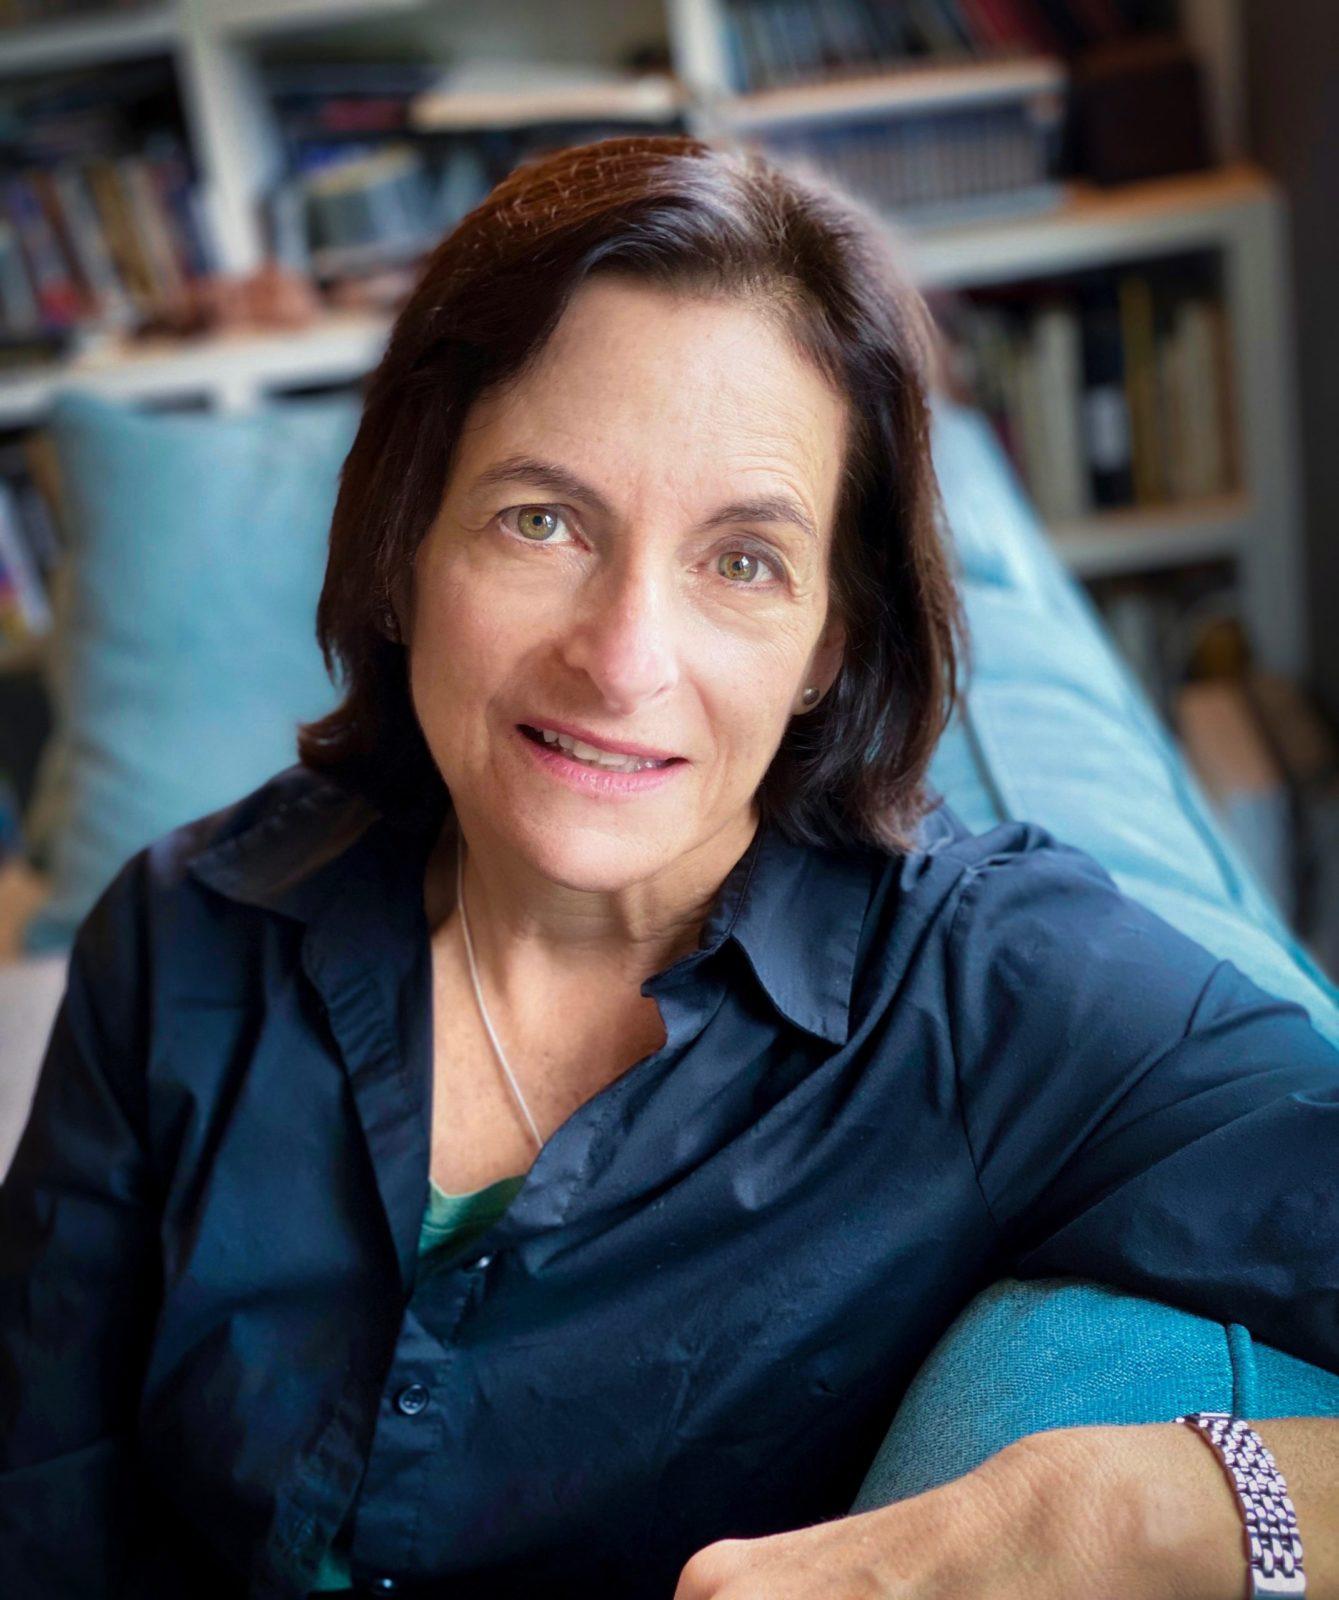 Kathleen SeligmanPhotography by Penni GladstoneMust Creditt~ 415.706.6960